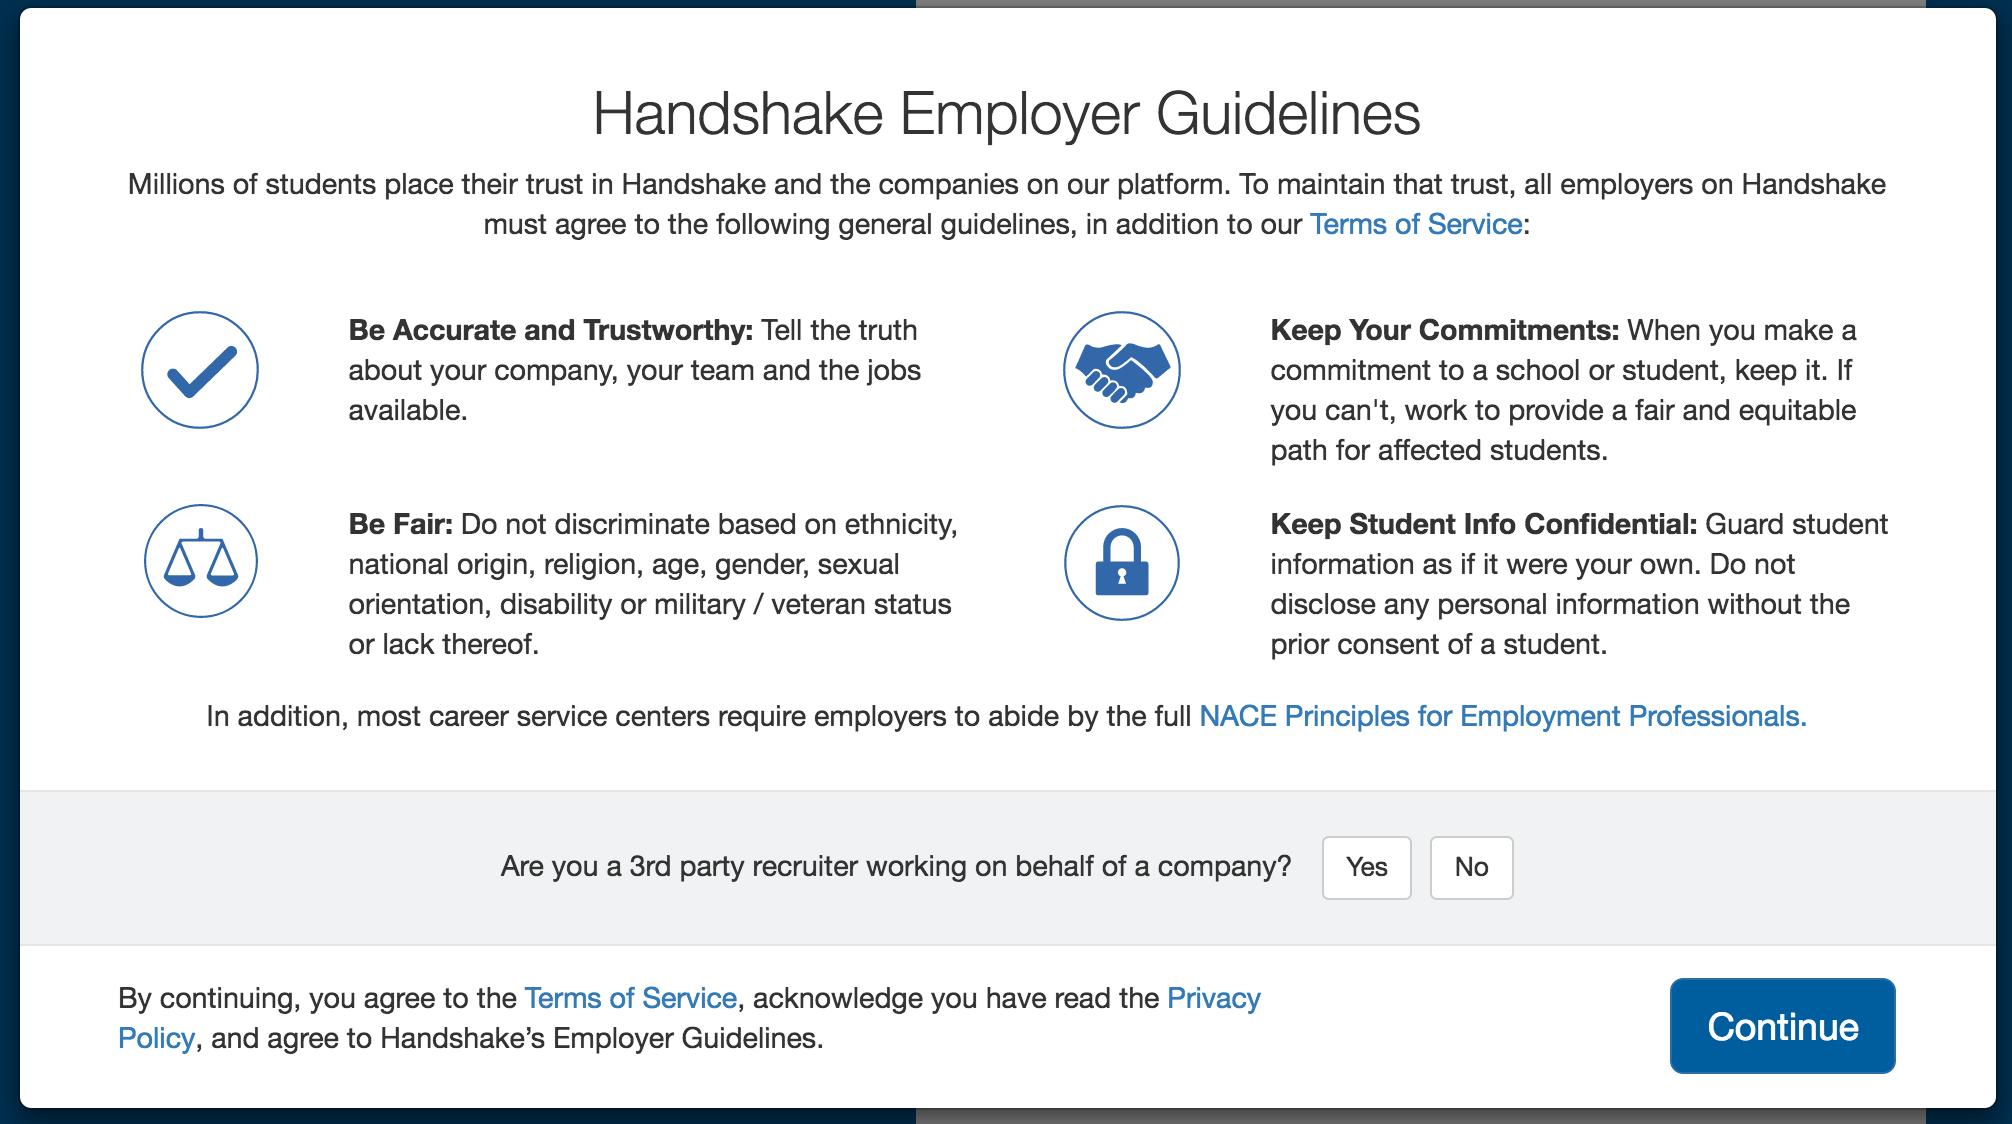 handshake user guide screenshot